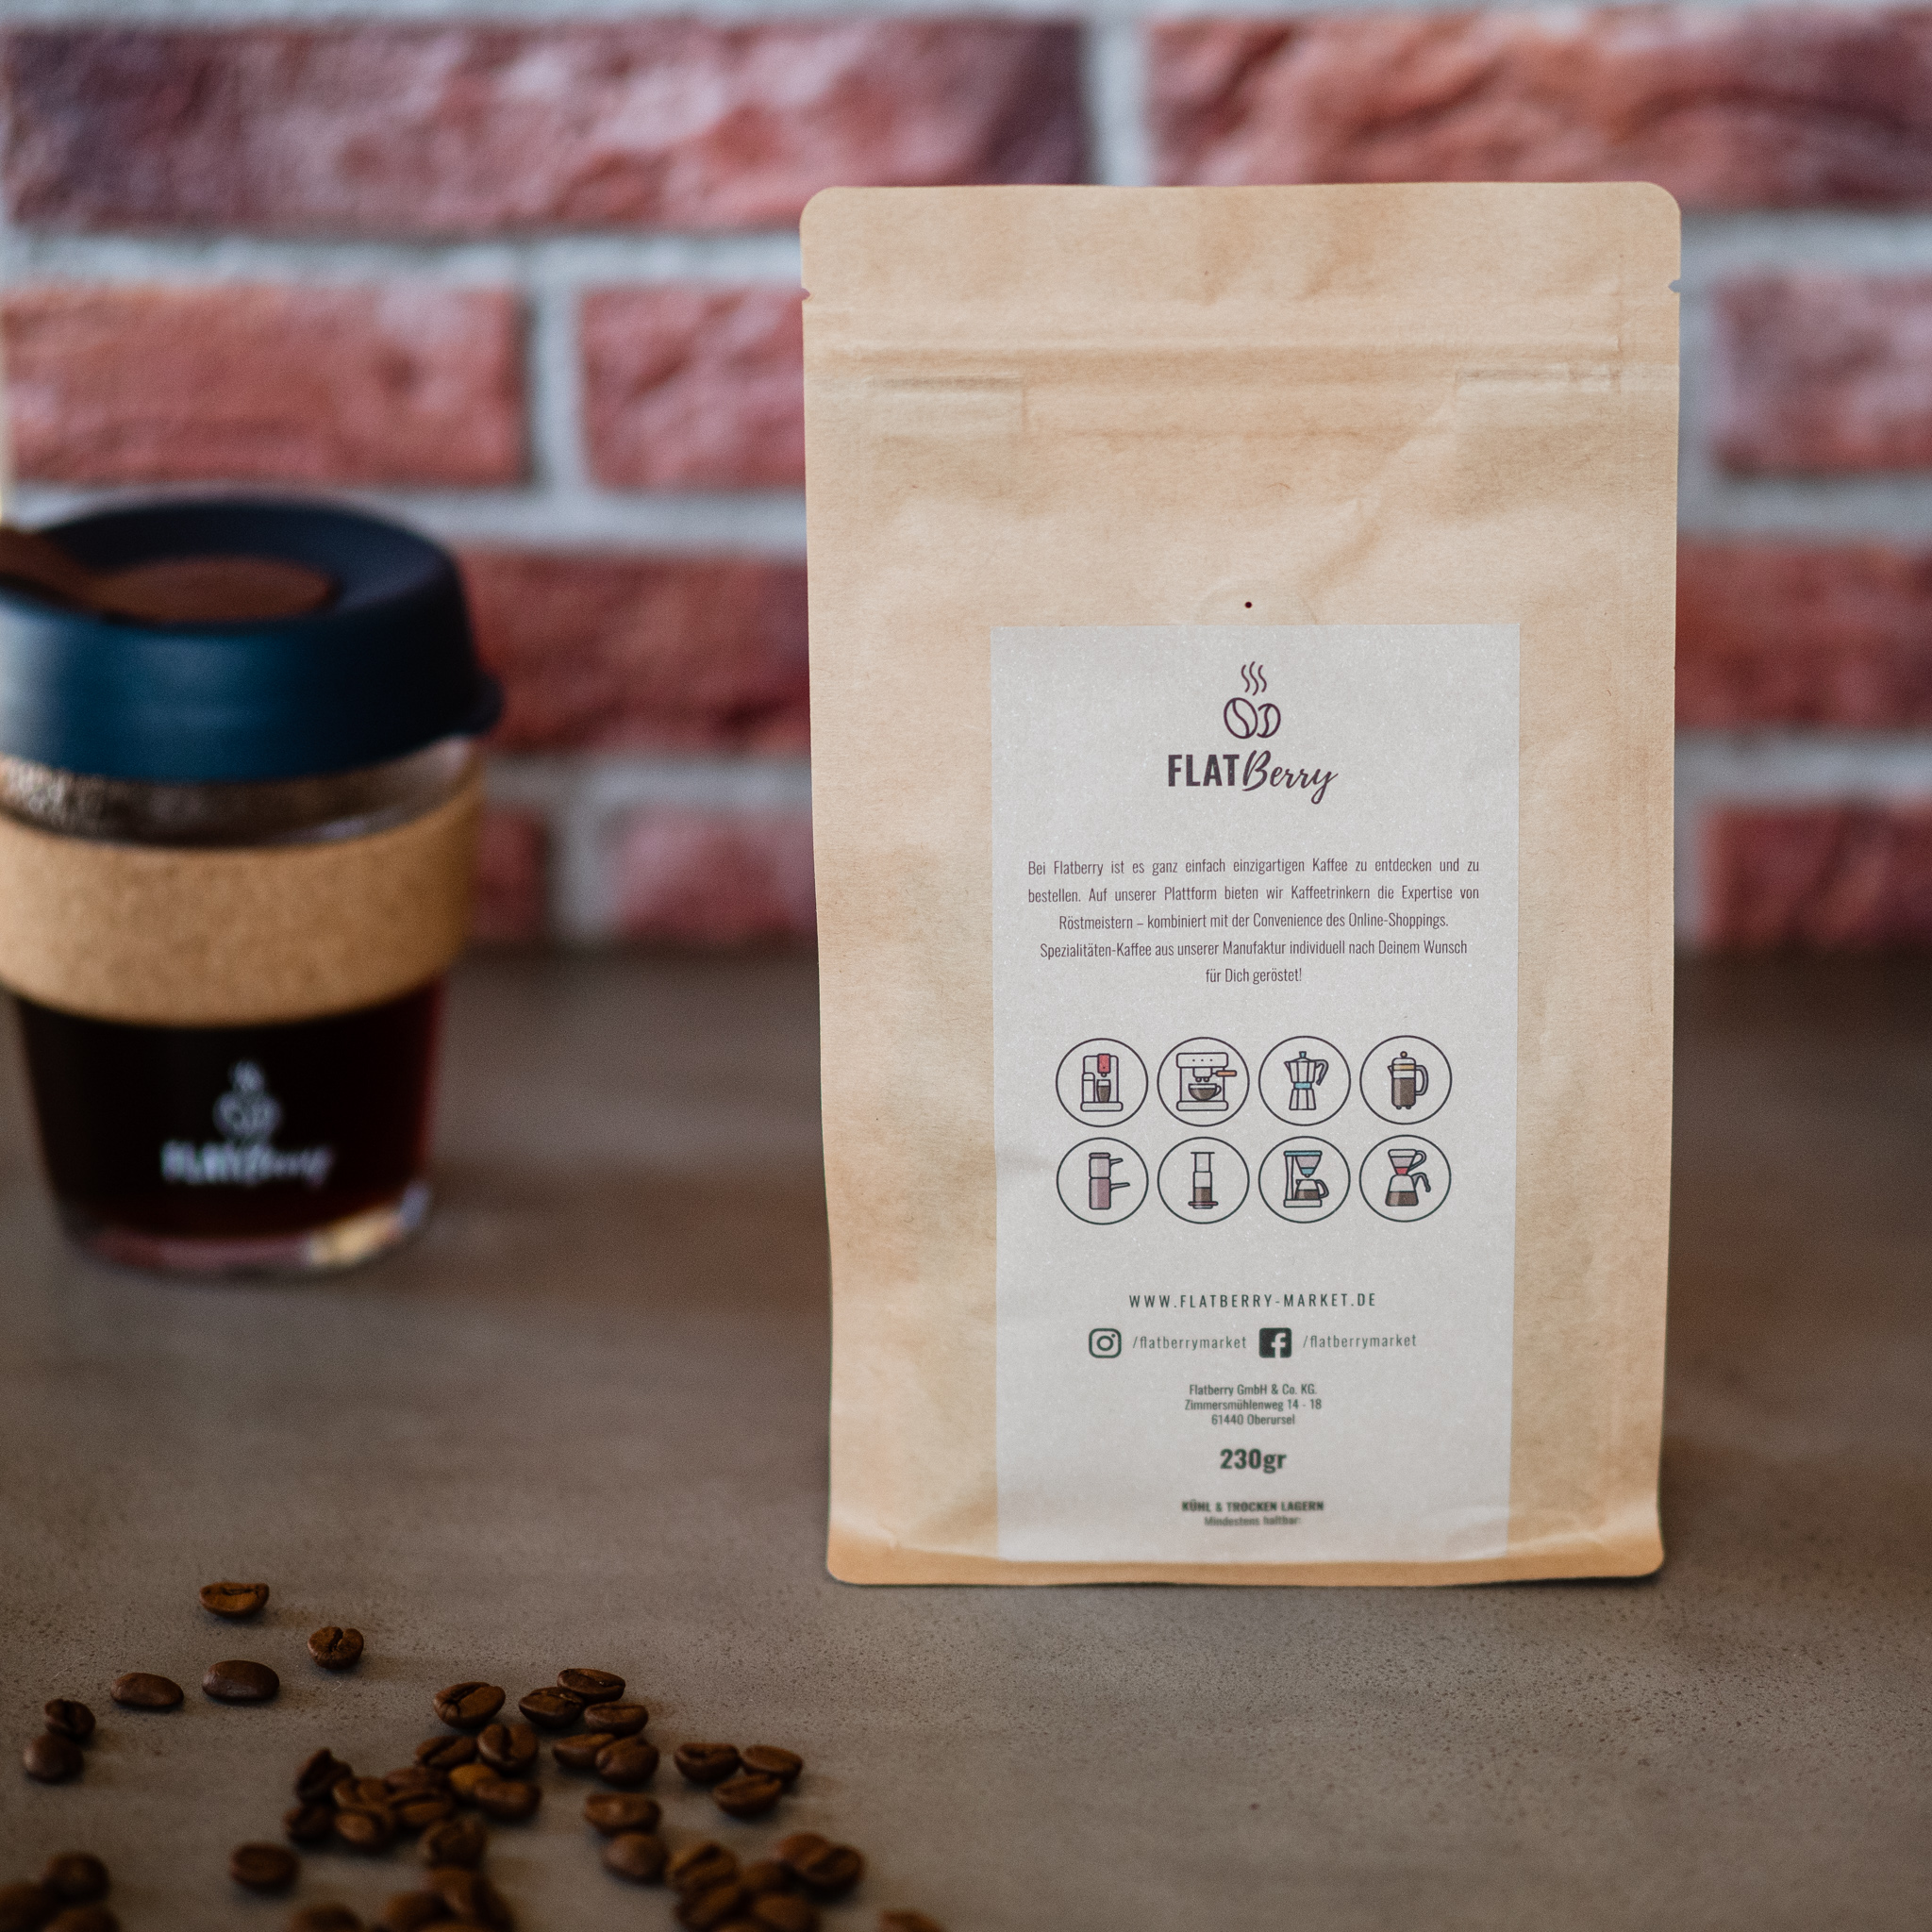 Flatberry_Kaffee_Rückseite_Verpackung_KeepCup